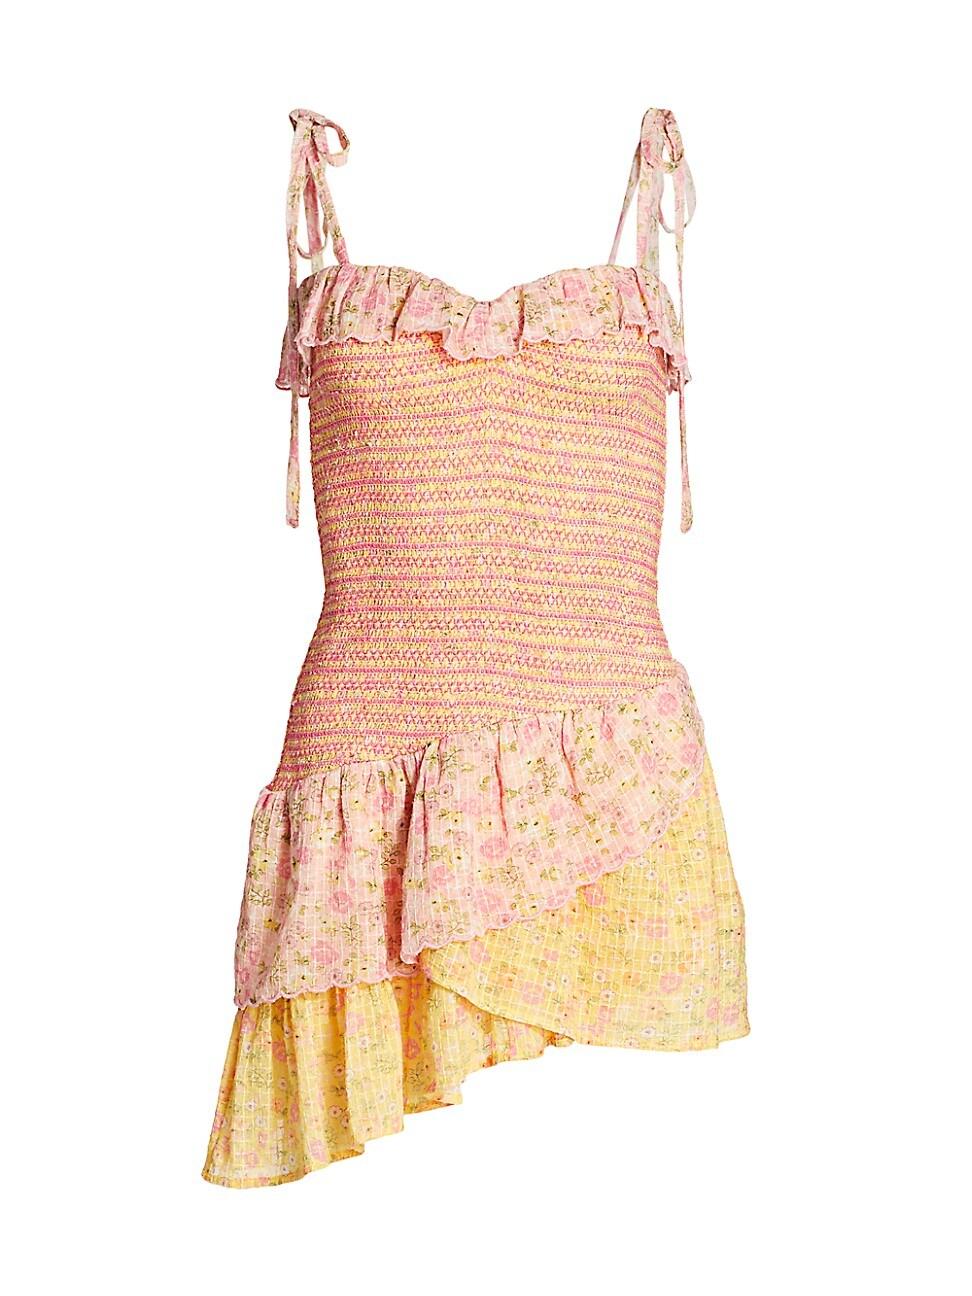 LOVESHACKFANCY WOMEN'S AYA SMOCKED MINI DRESS